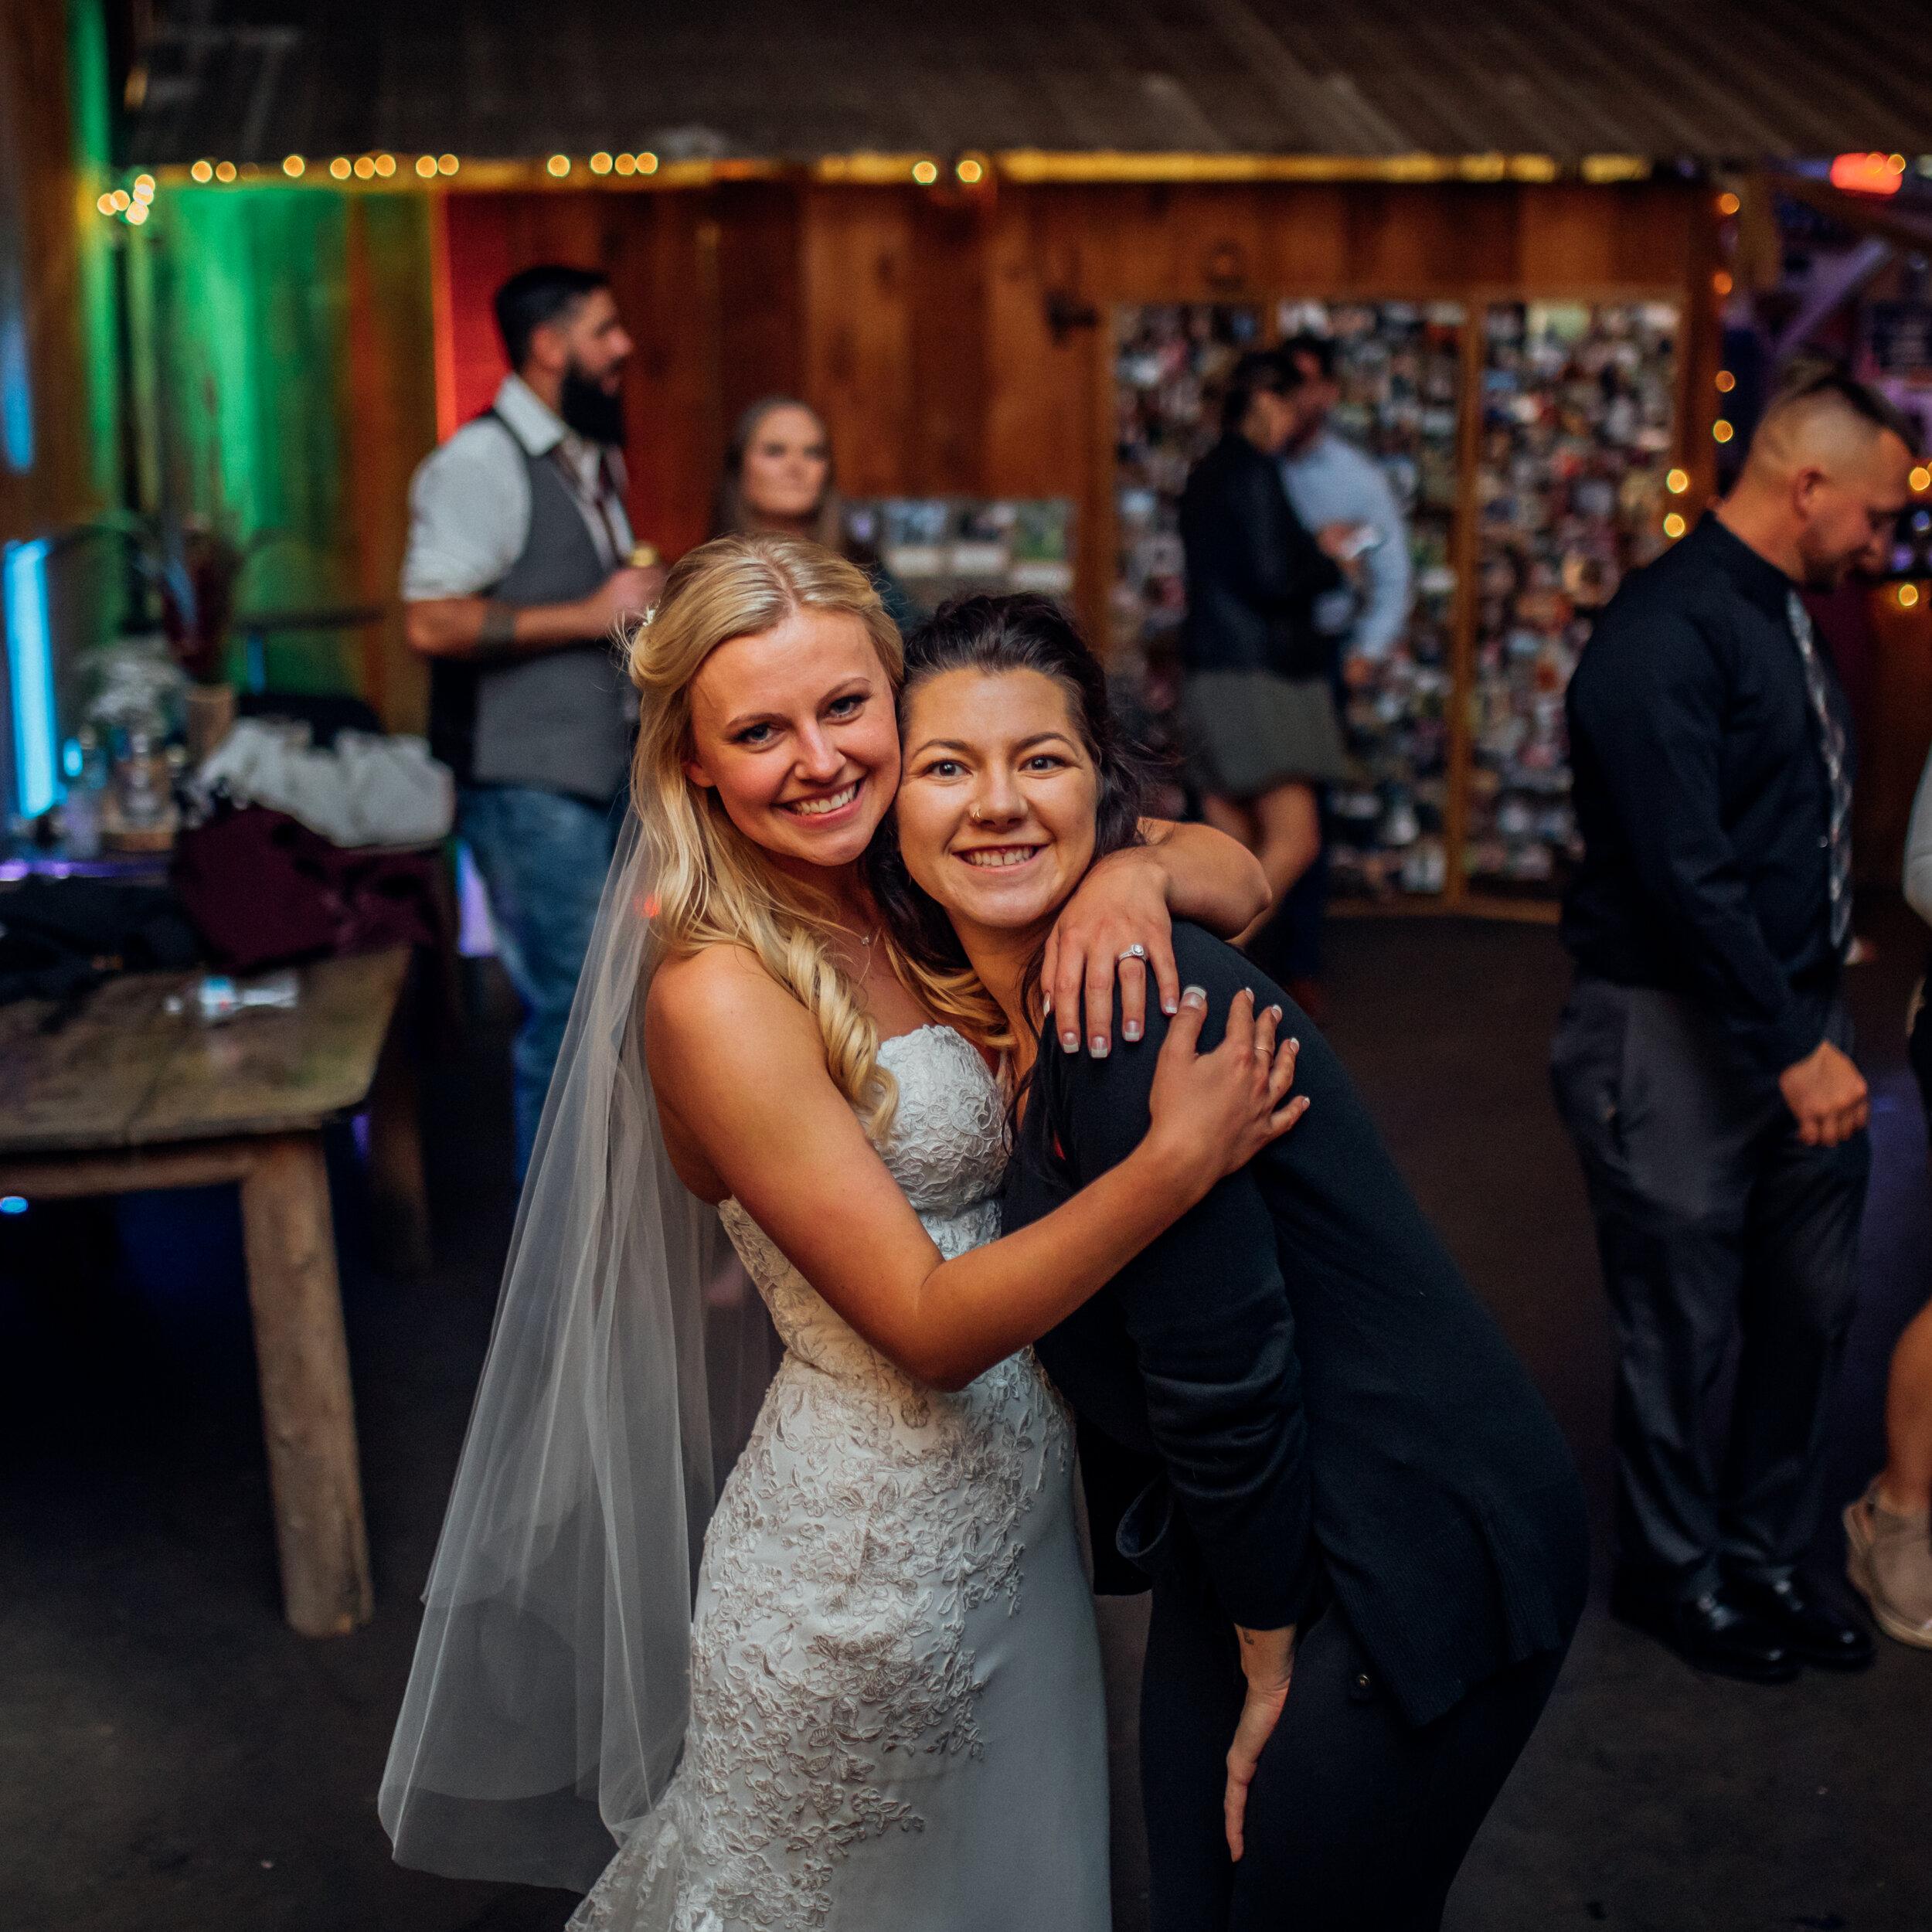 kayla-of-emerald-tide-photography-hugging-bride-at-kettle-moraine-ranch-wedding.jpg